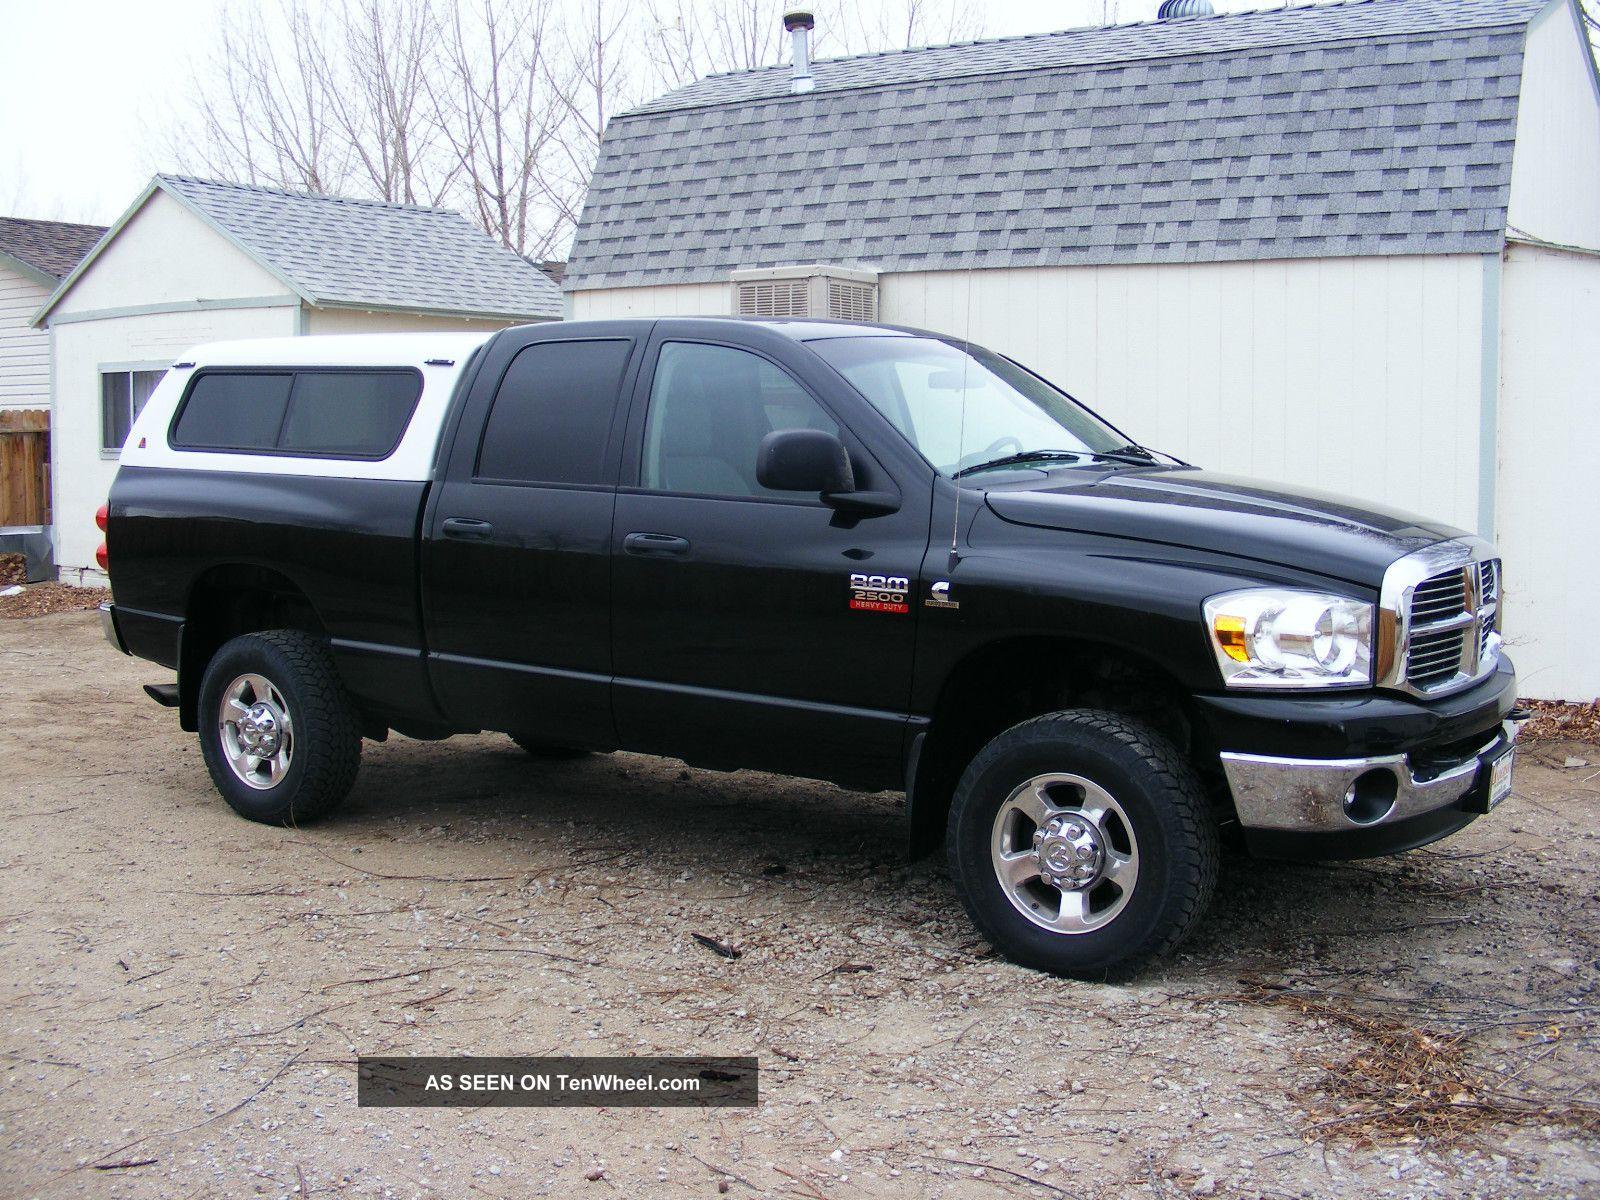 2008 dodge diesel ram 2500 hd 4 x 4 crew cab. Black Bedroom Furniture Sets. Home Design Ideas